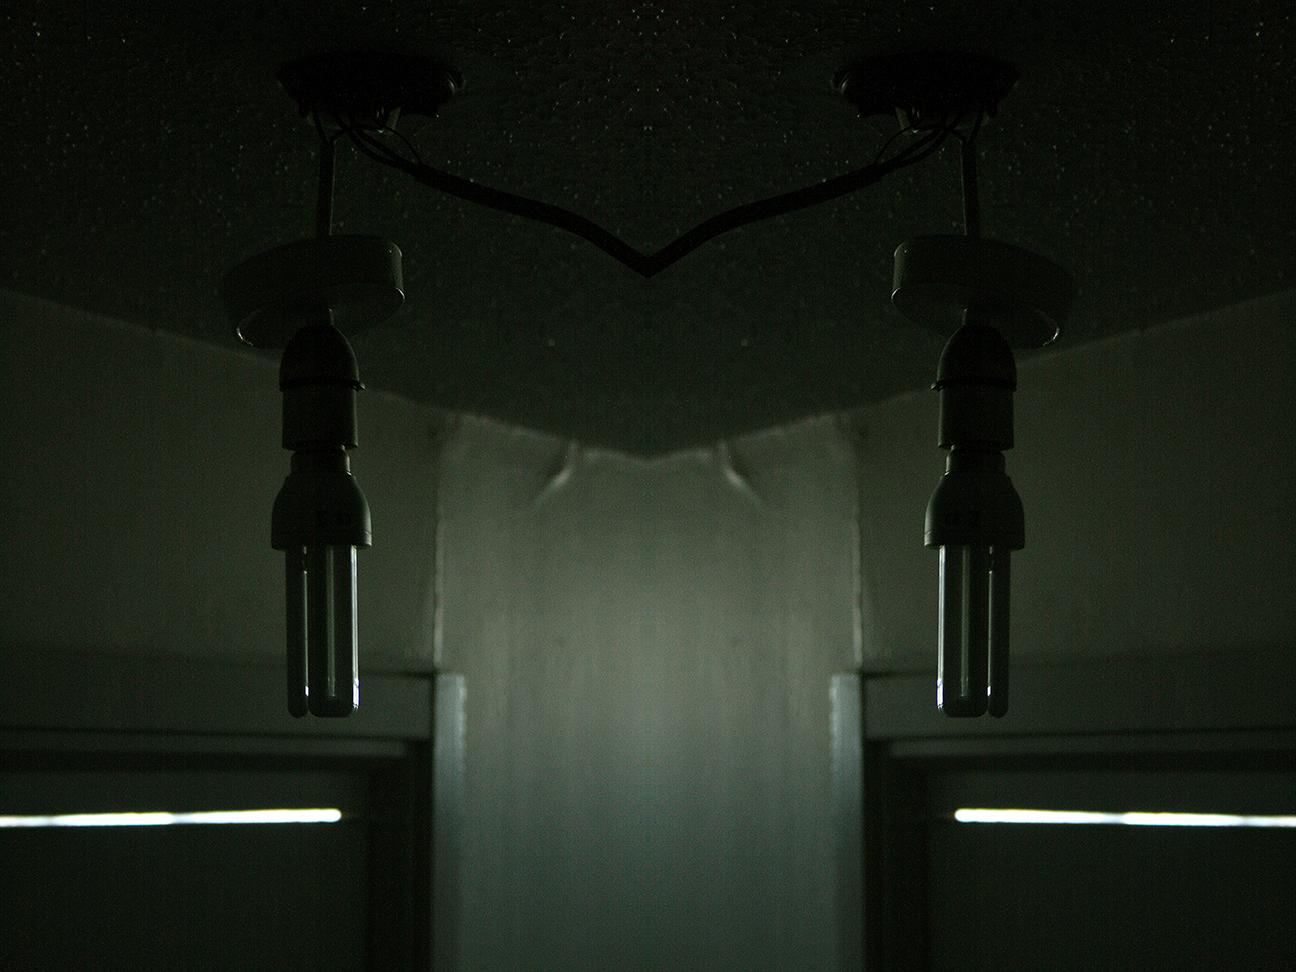 House (mirror)